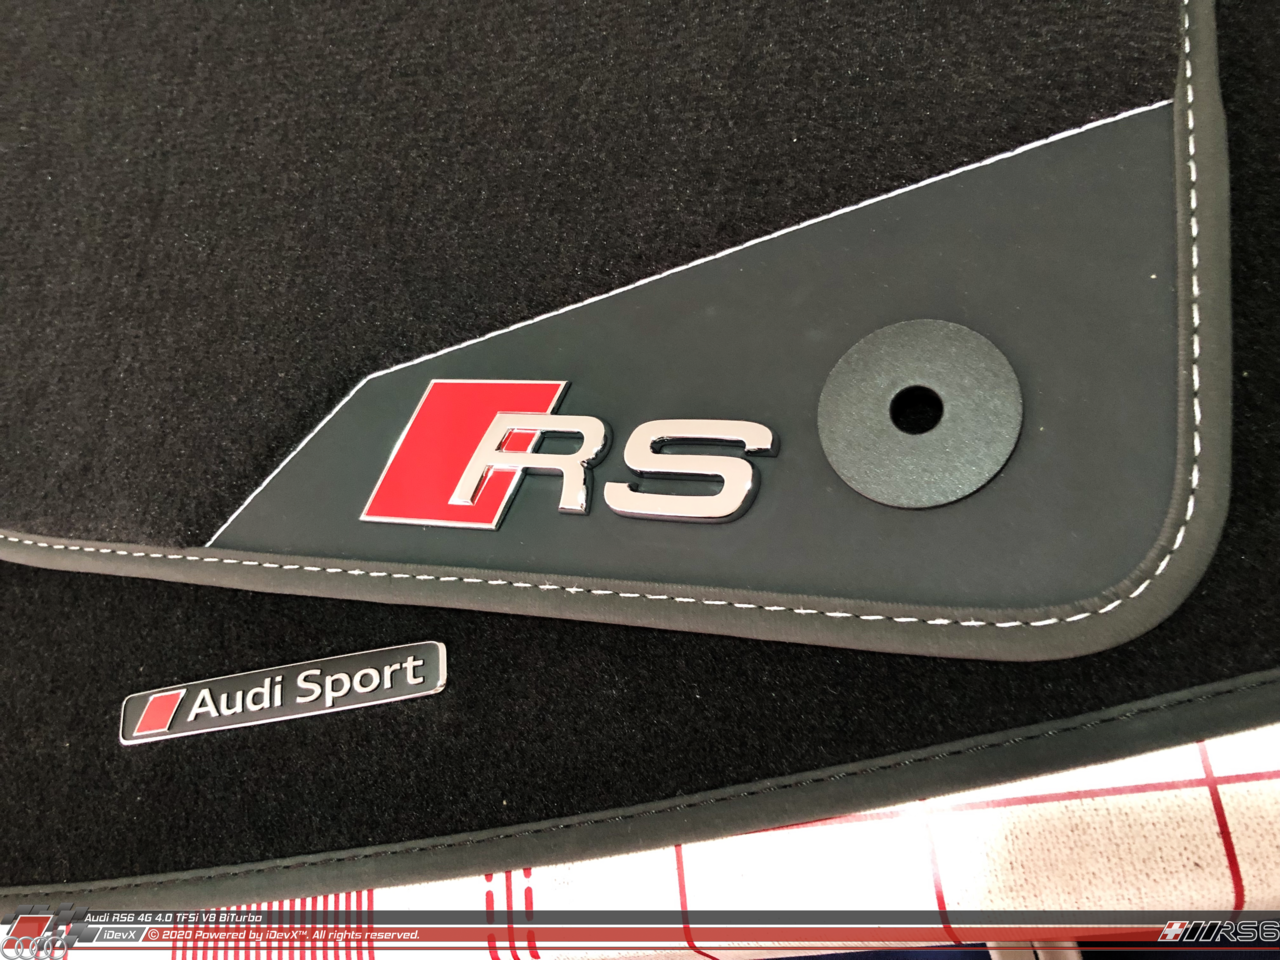 15_08.2019_Audi-RS6_iDevX_013.png